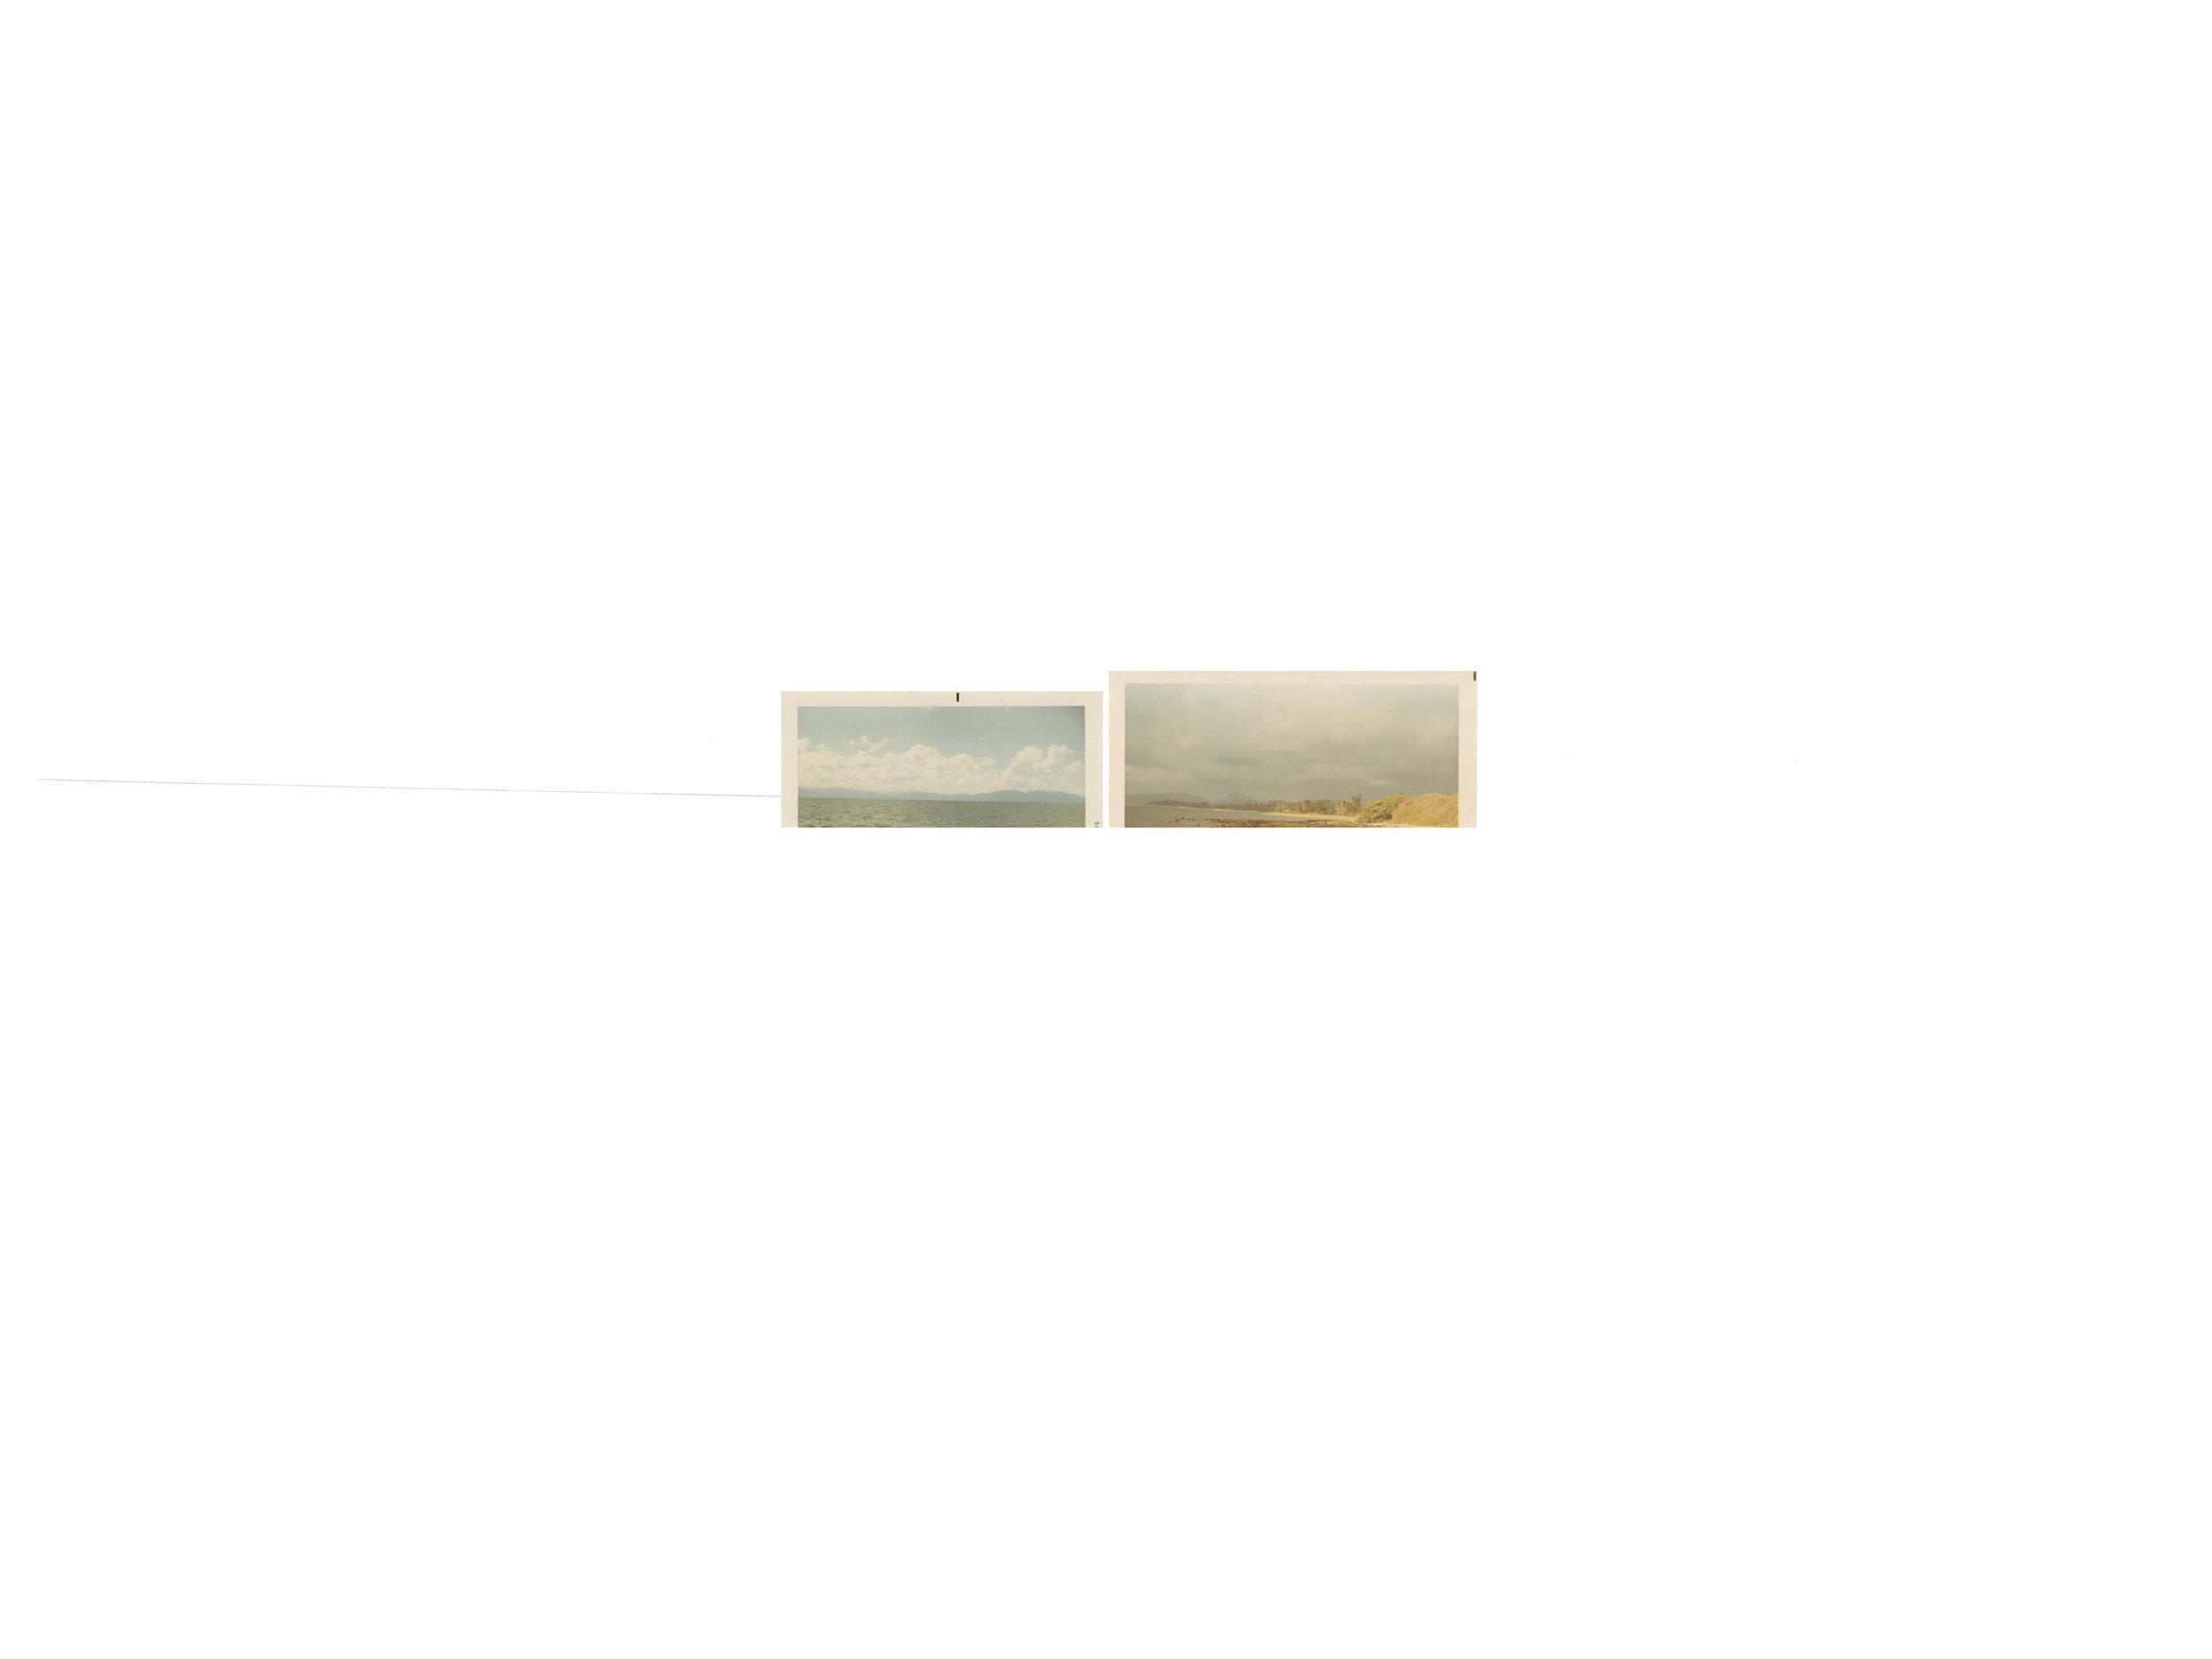 Westward Yearning No. 34  18 x 24 inches | 2019